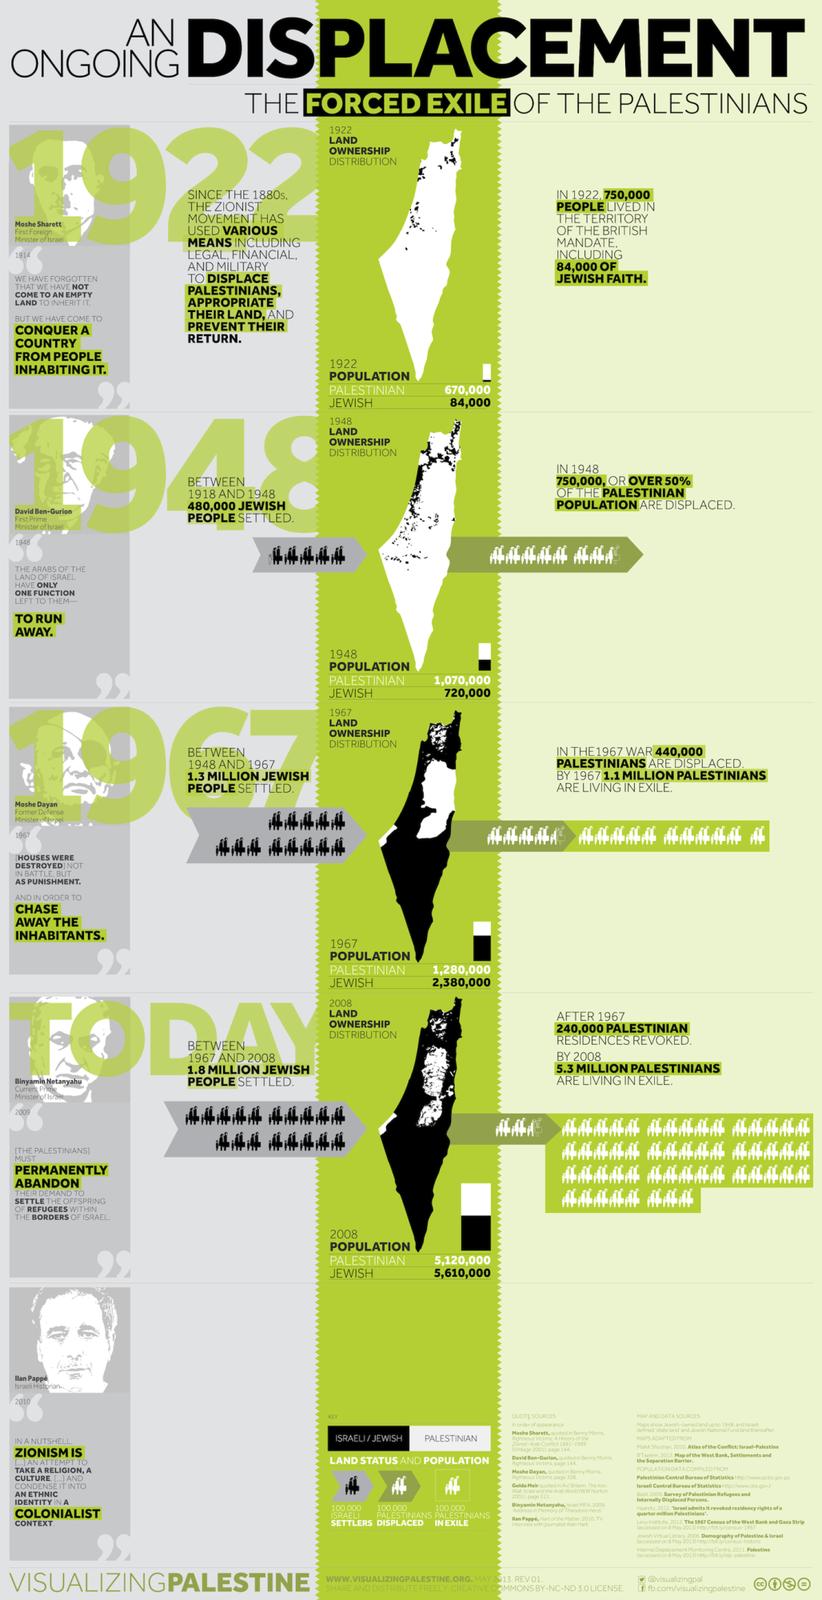 Palestine : 65 ans de colonisation Vp-an_ongoing_displacement-en-20130514